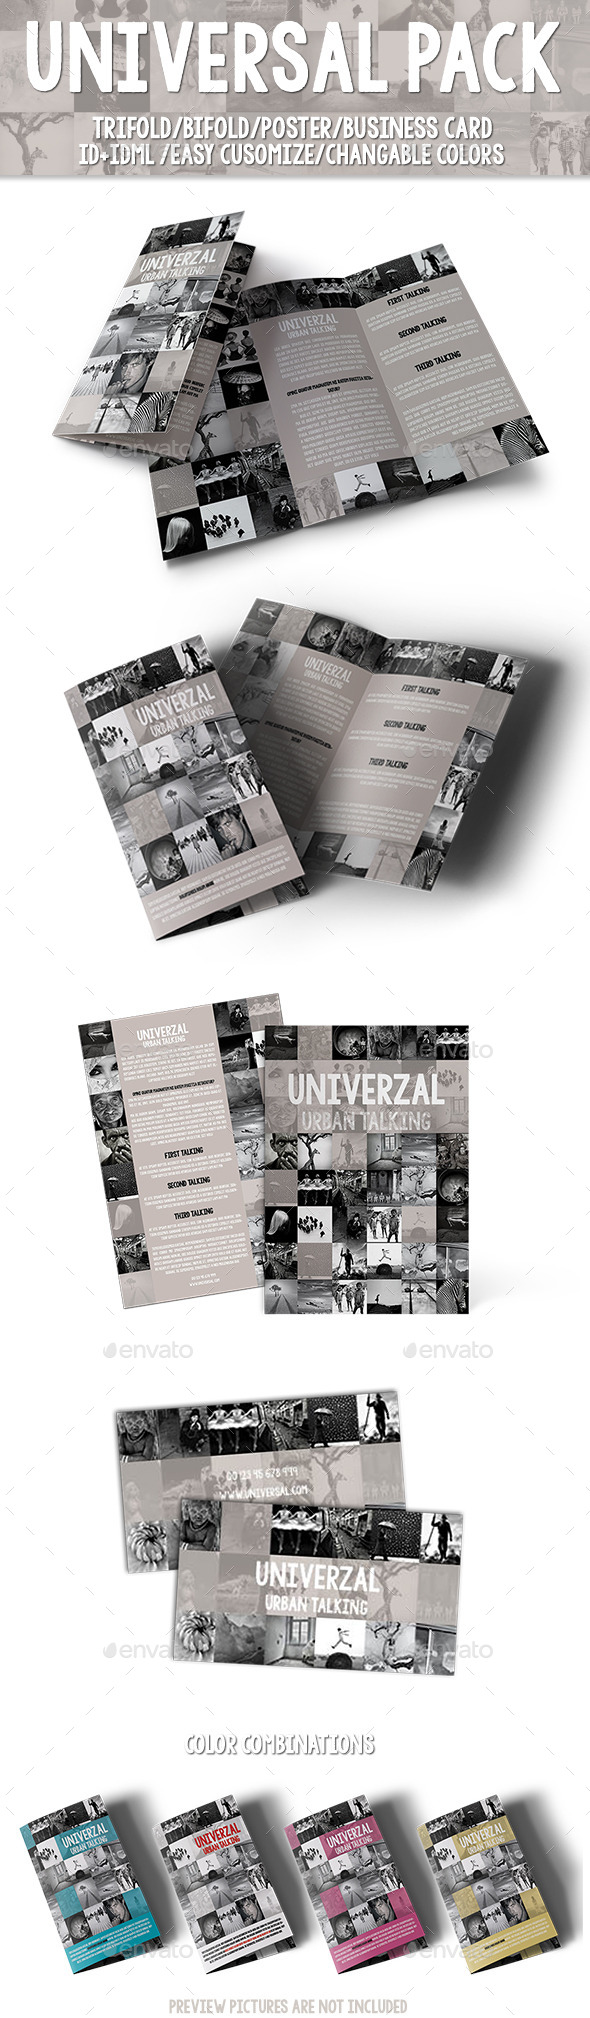 Universal Pack - Print Templates